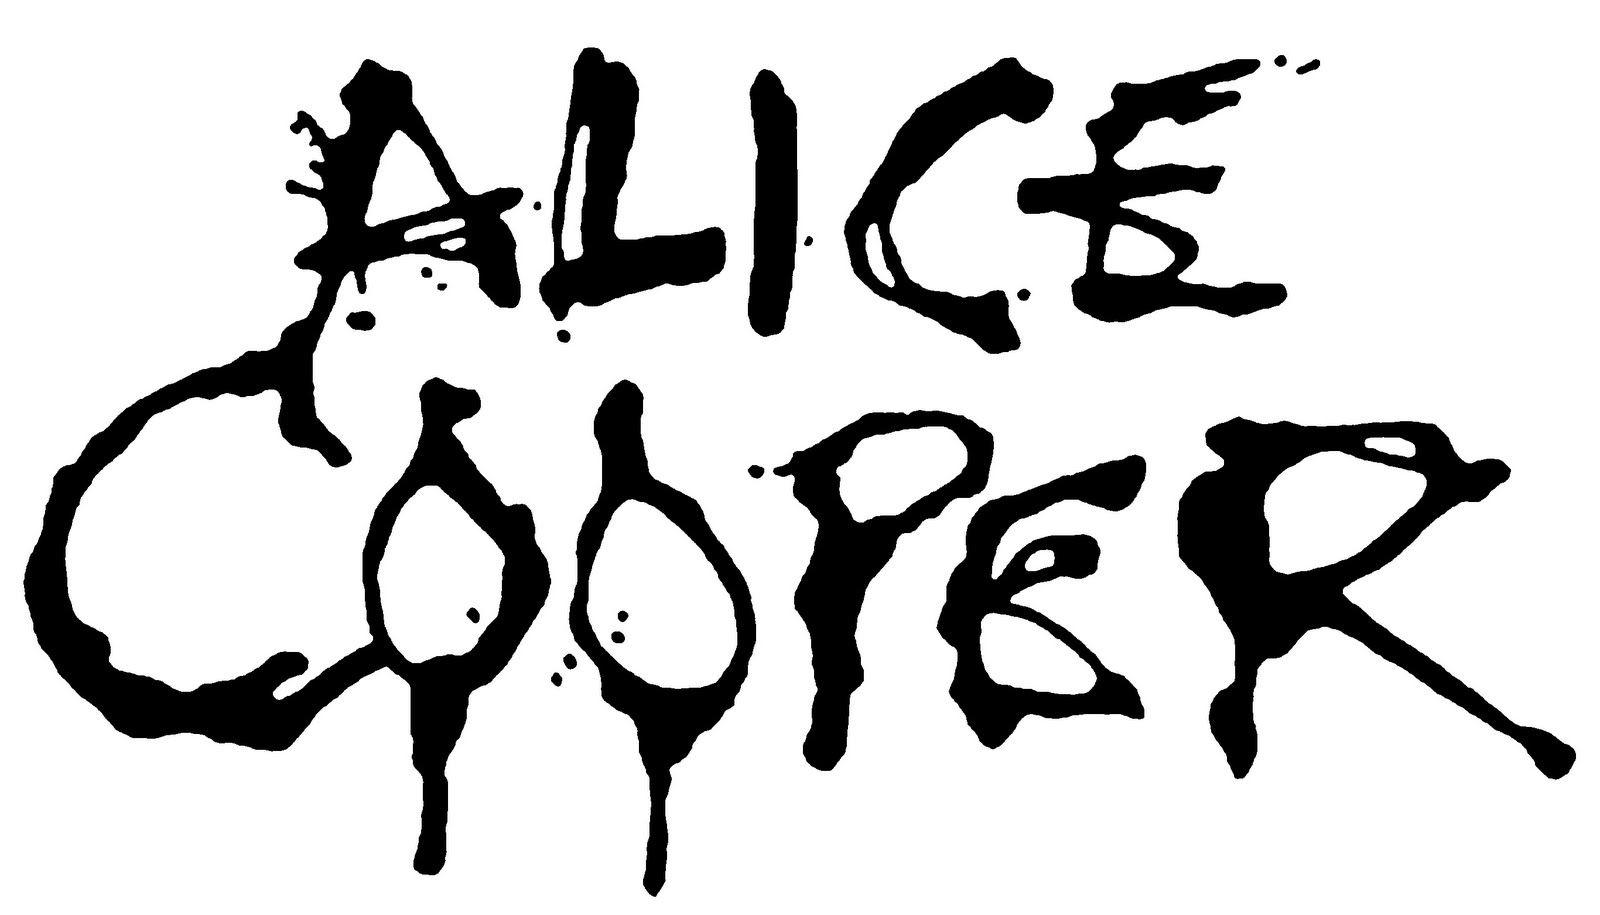 Logotipo de Alice Cooper.